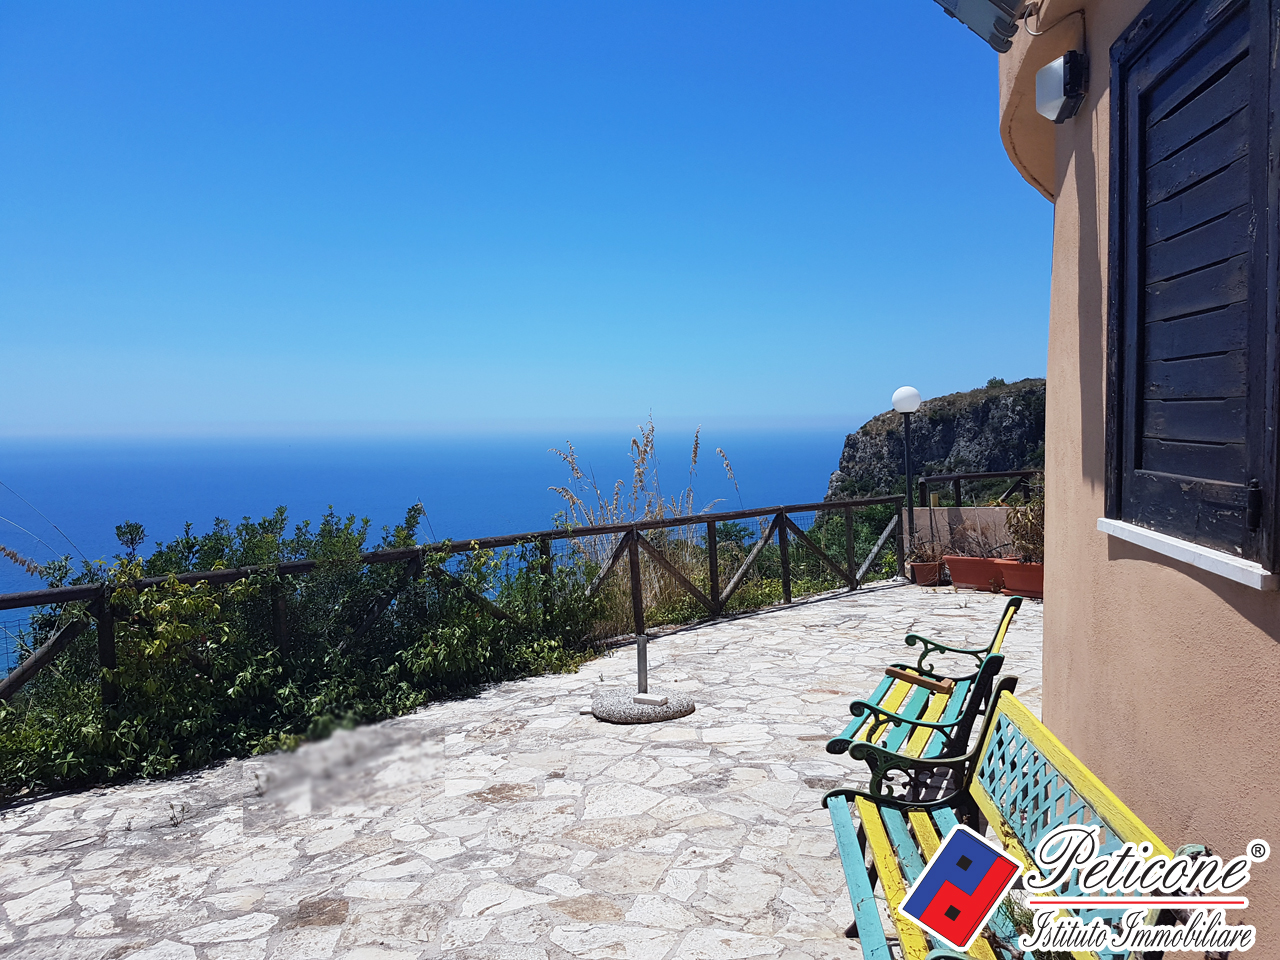 Villa in Vendita a Sperlonga: 4 locali, 90 mq - Foto 2